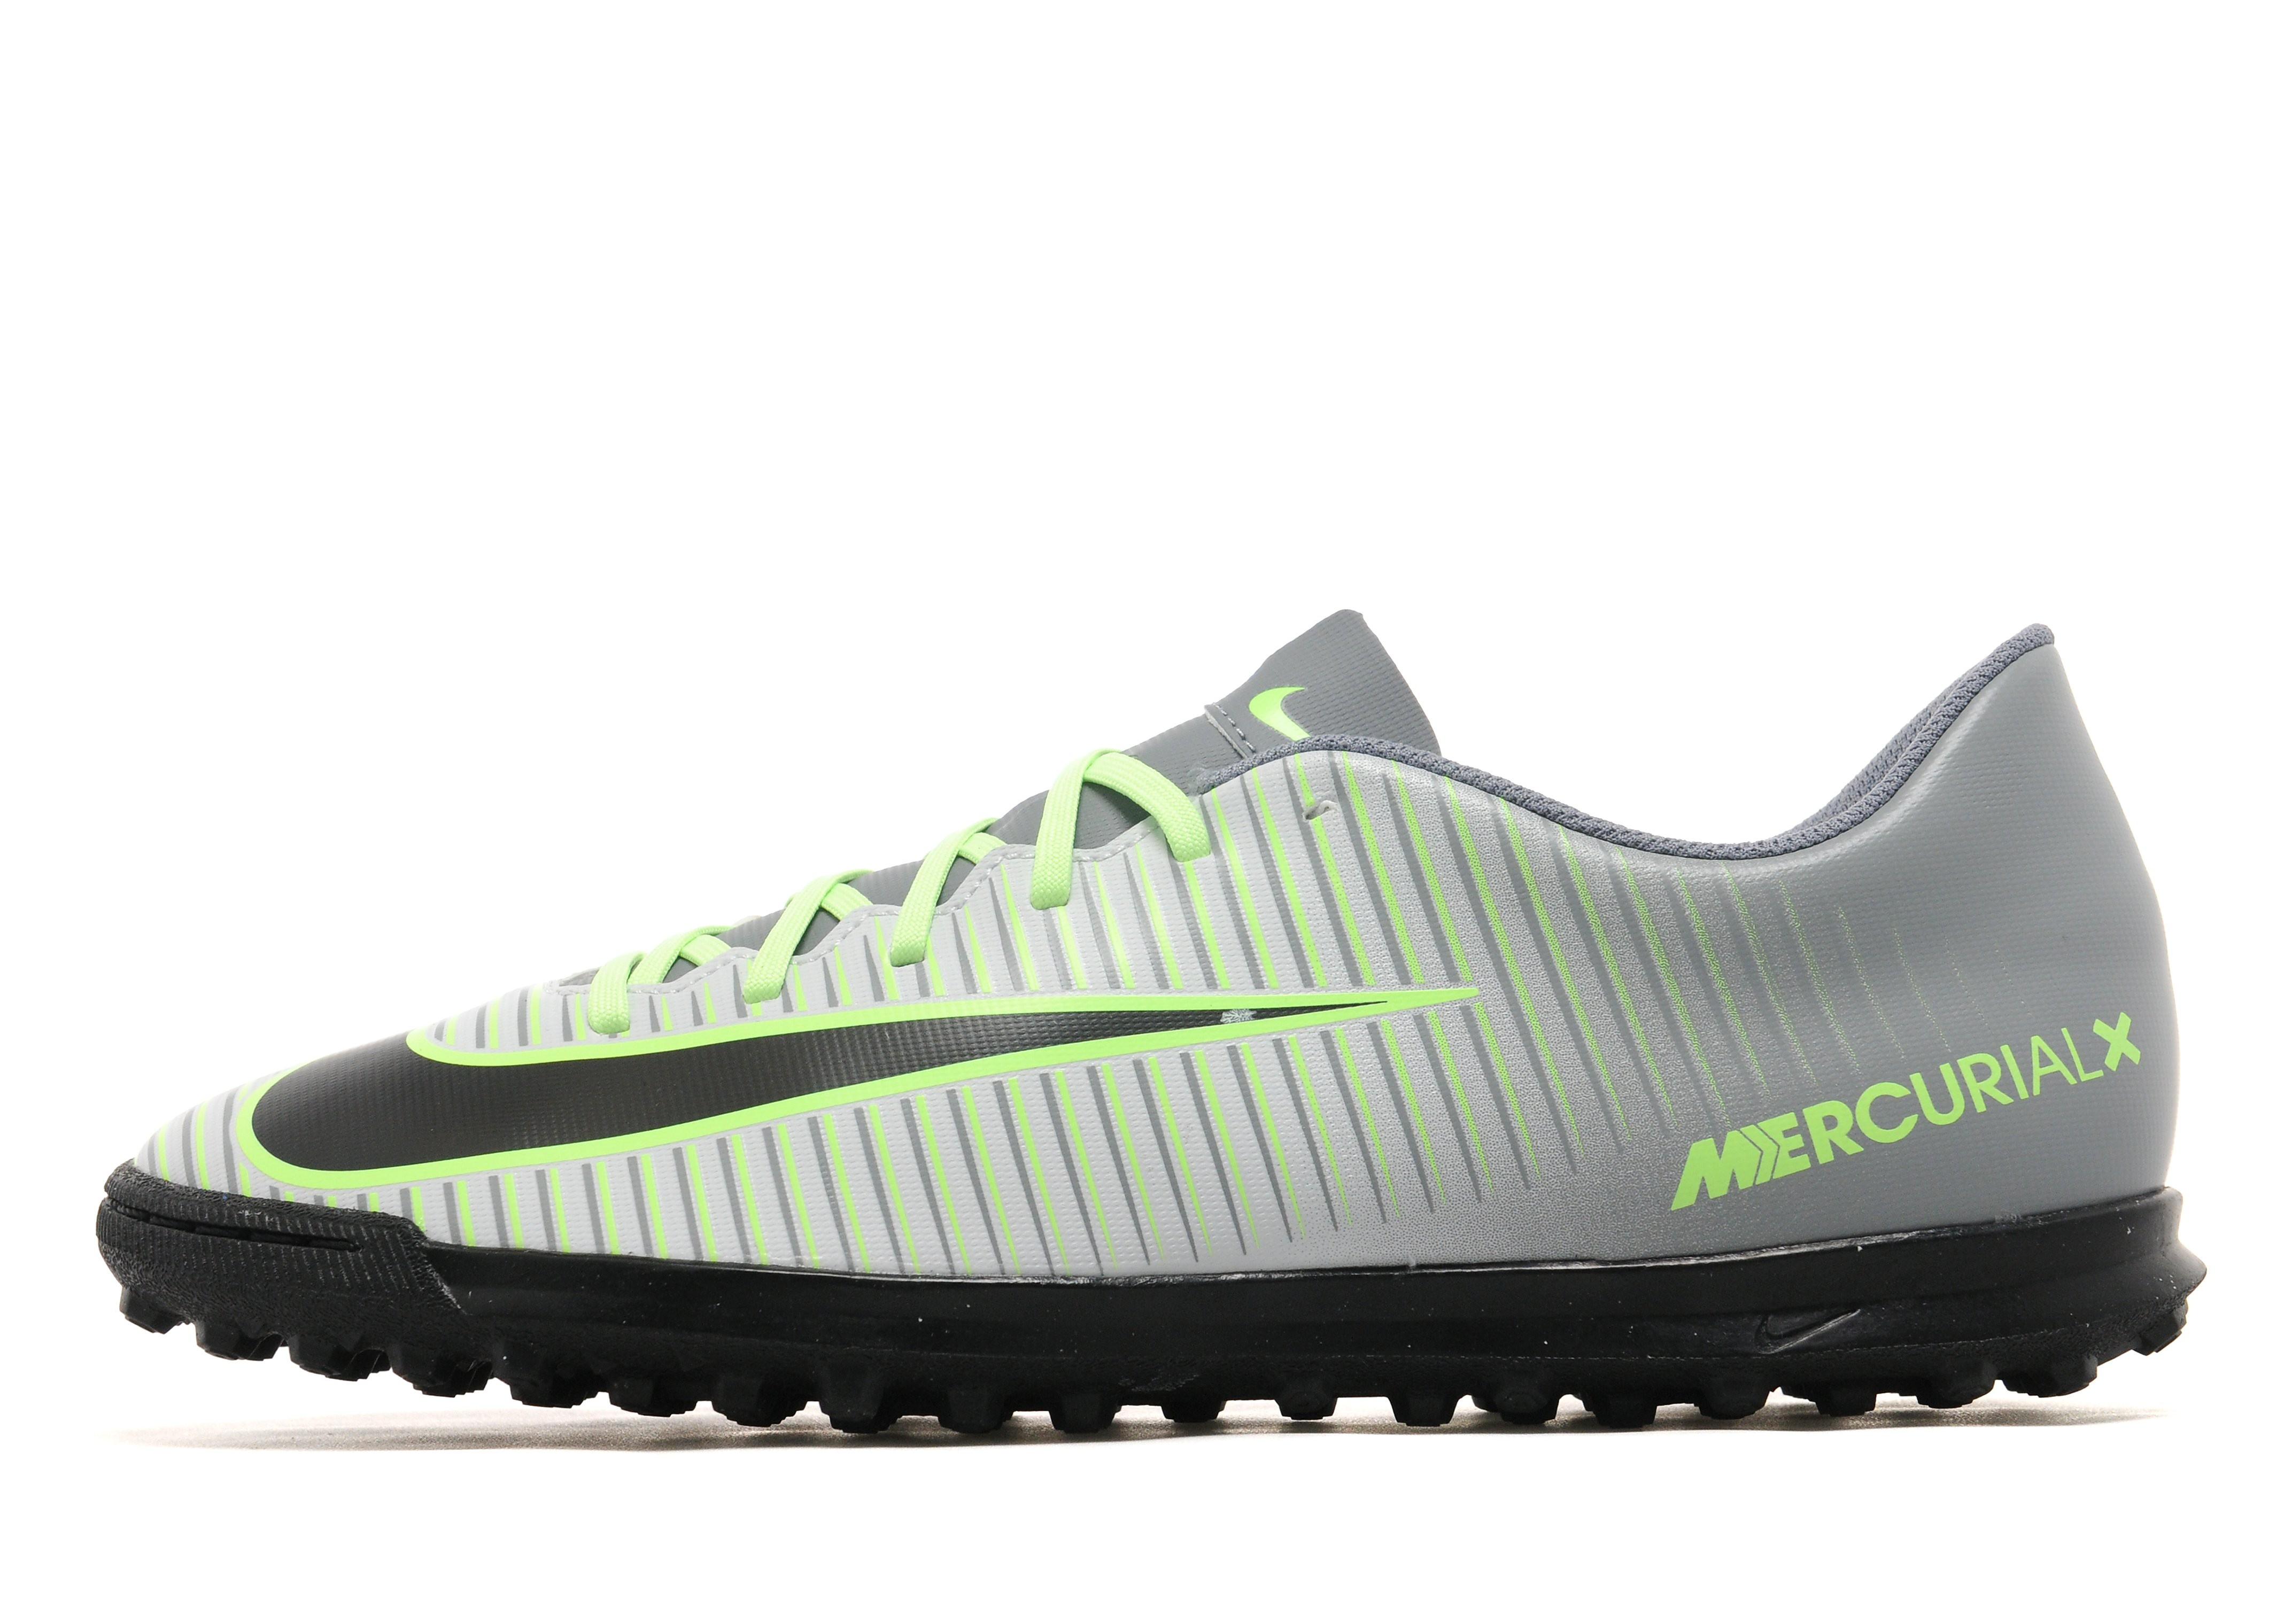 Nike Elite Mercurial Vortex II FG